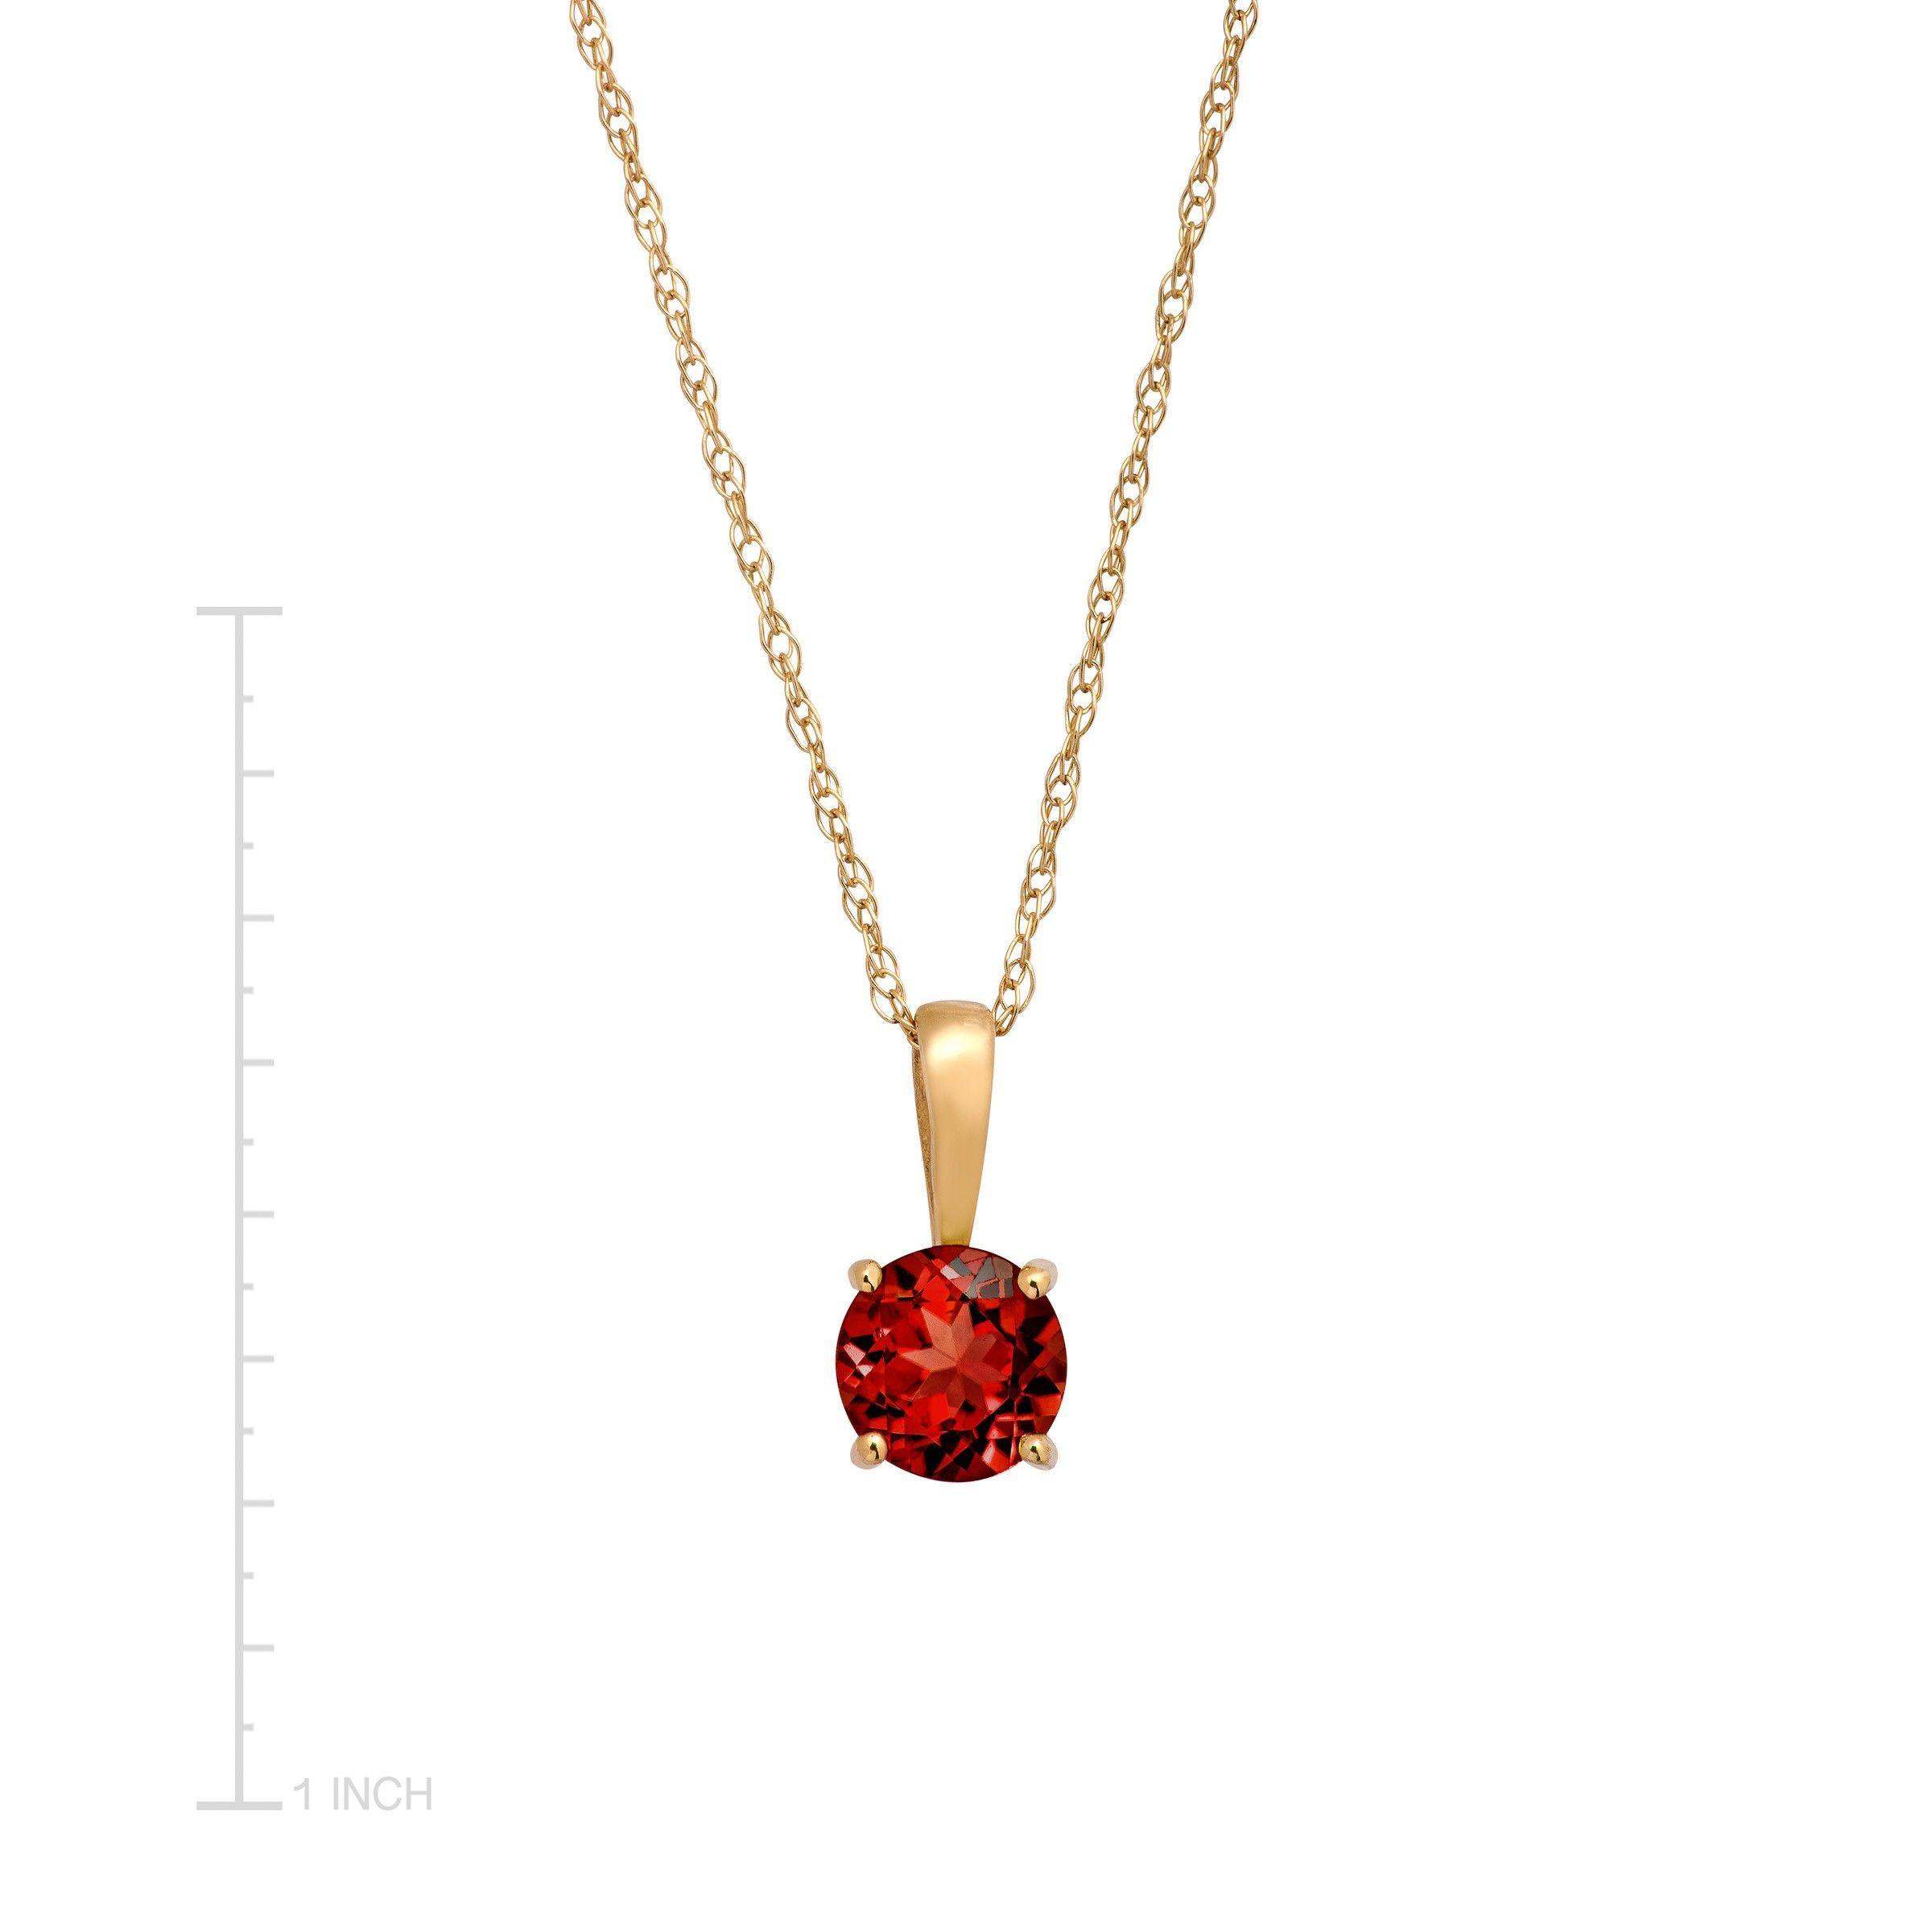 Round-Cut-Stone-Pendant-in-10K-Gold thumbnail 16